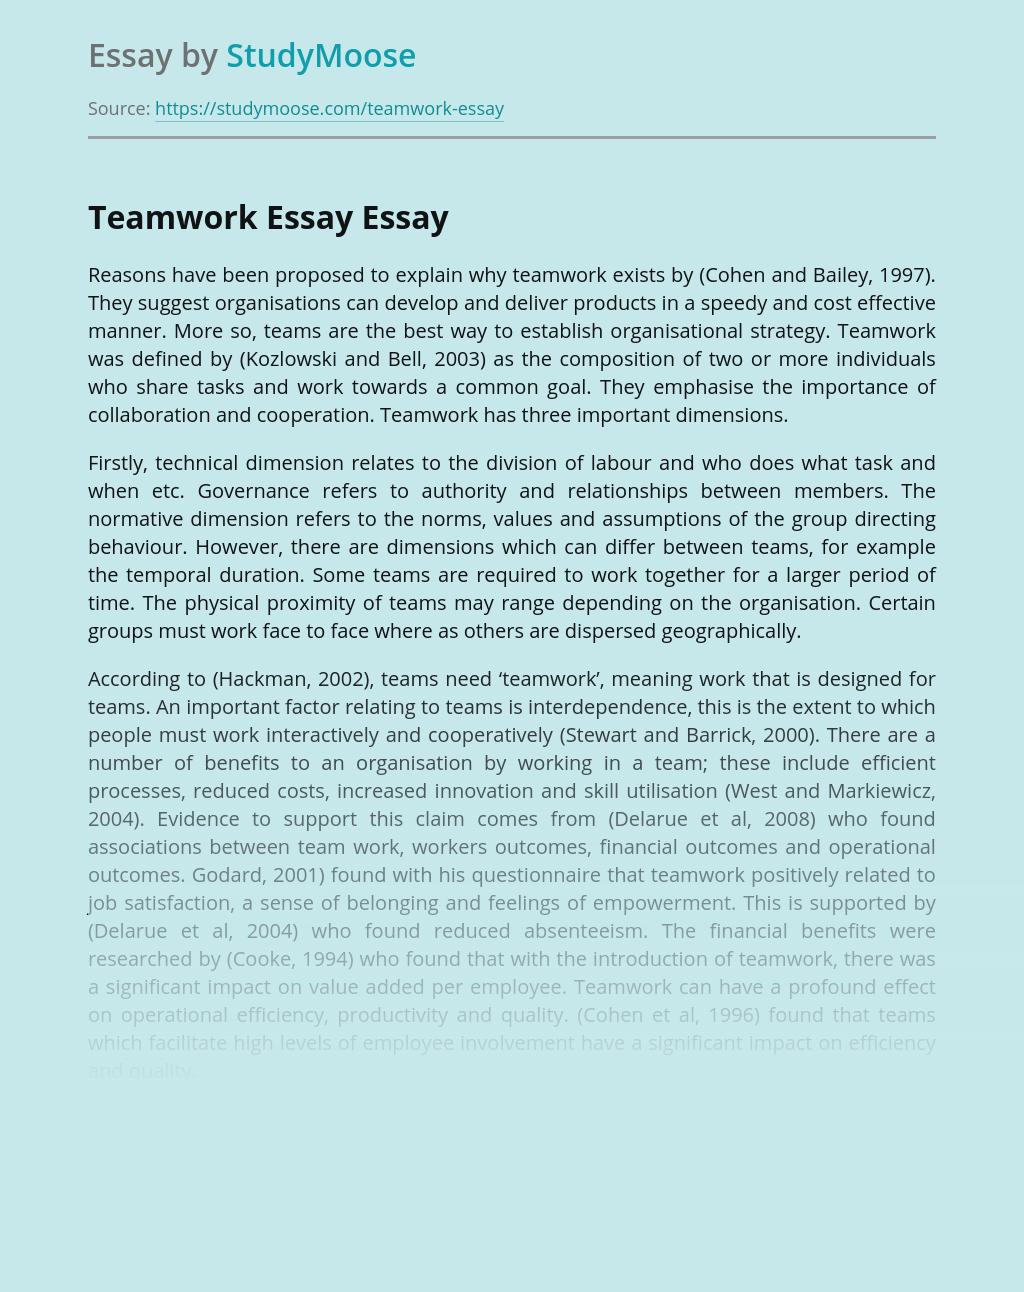 Teamwork Essay